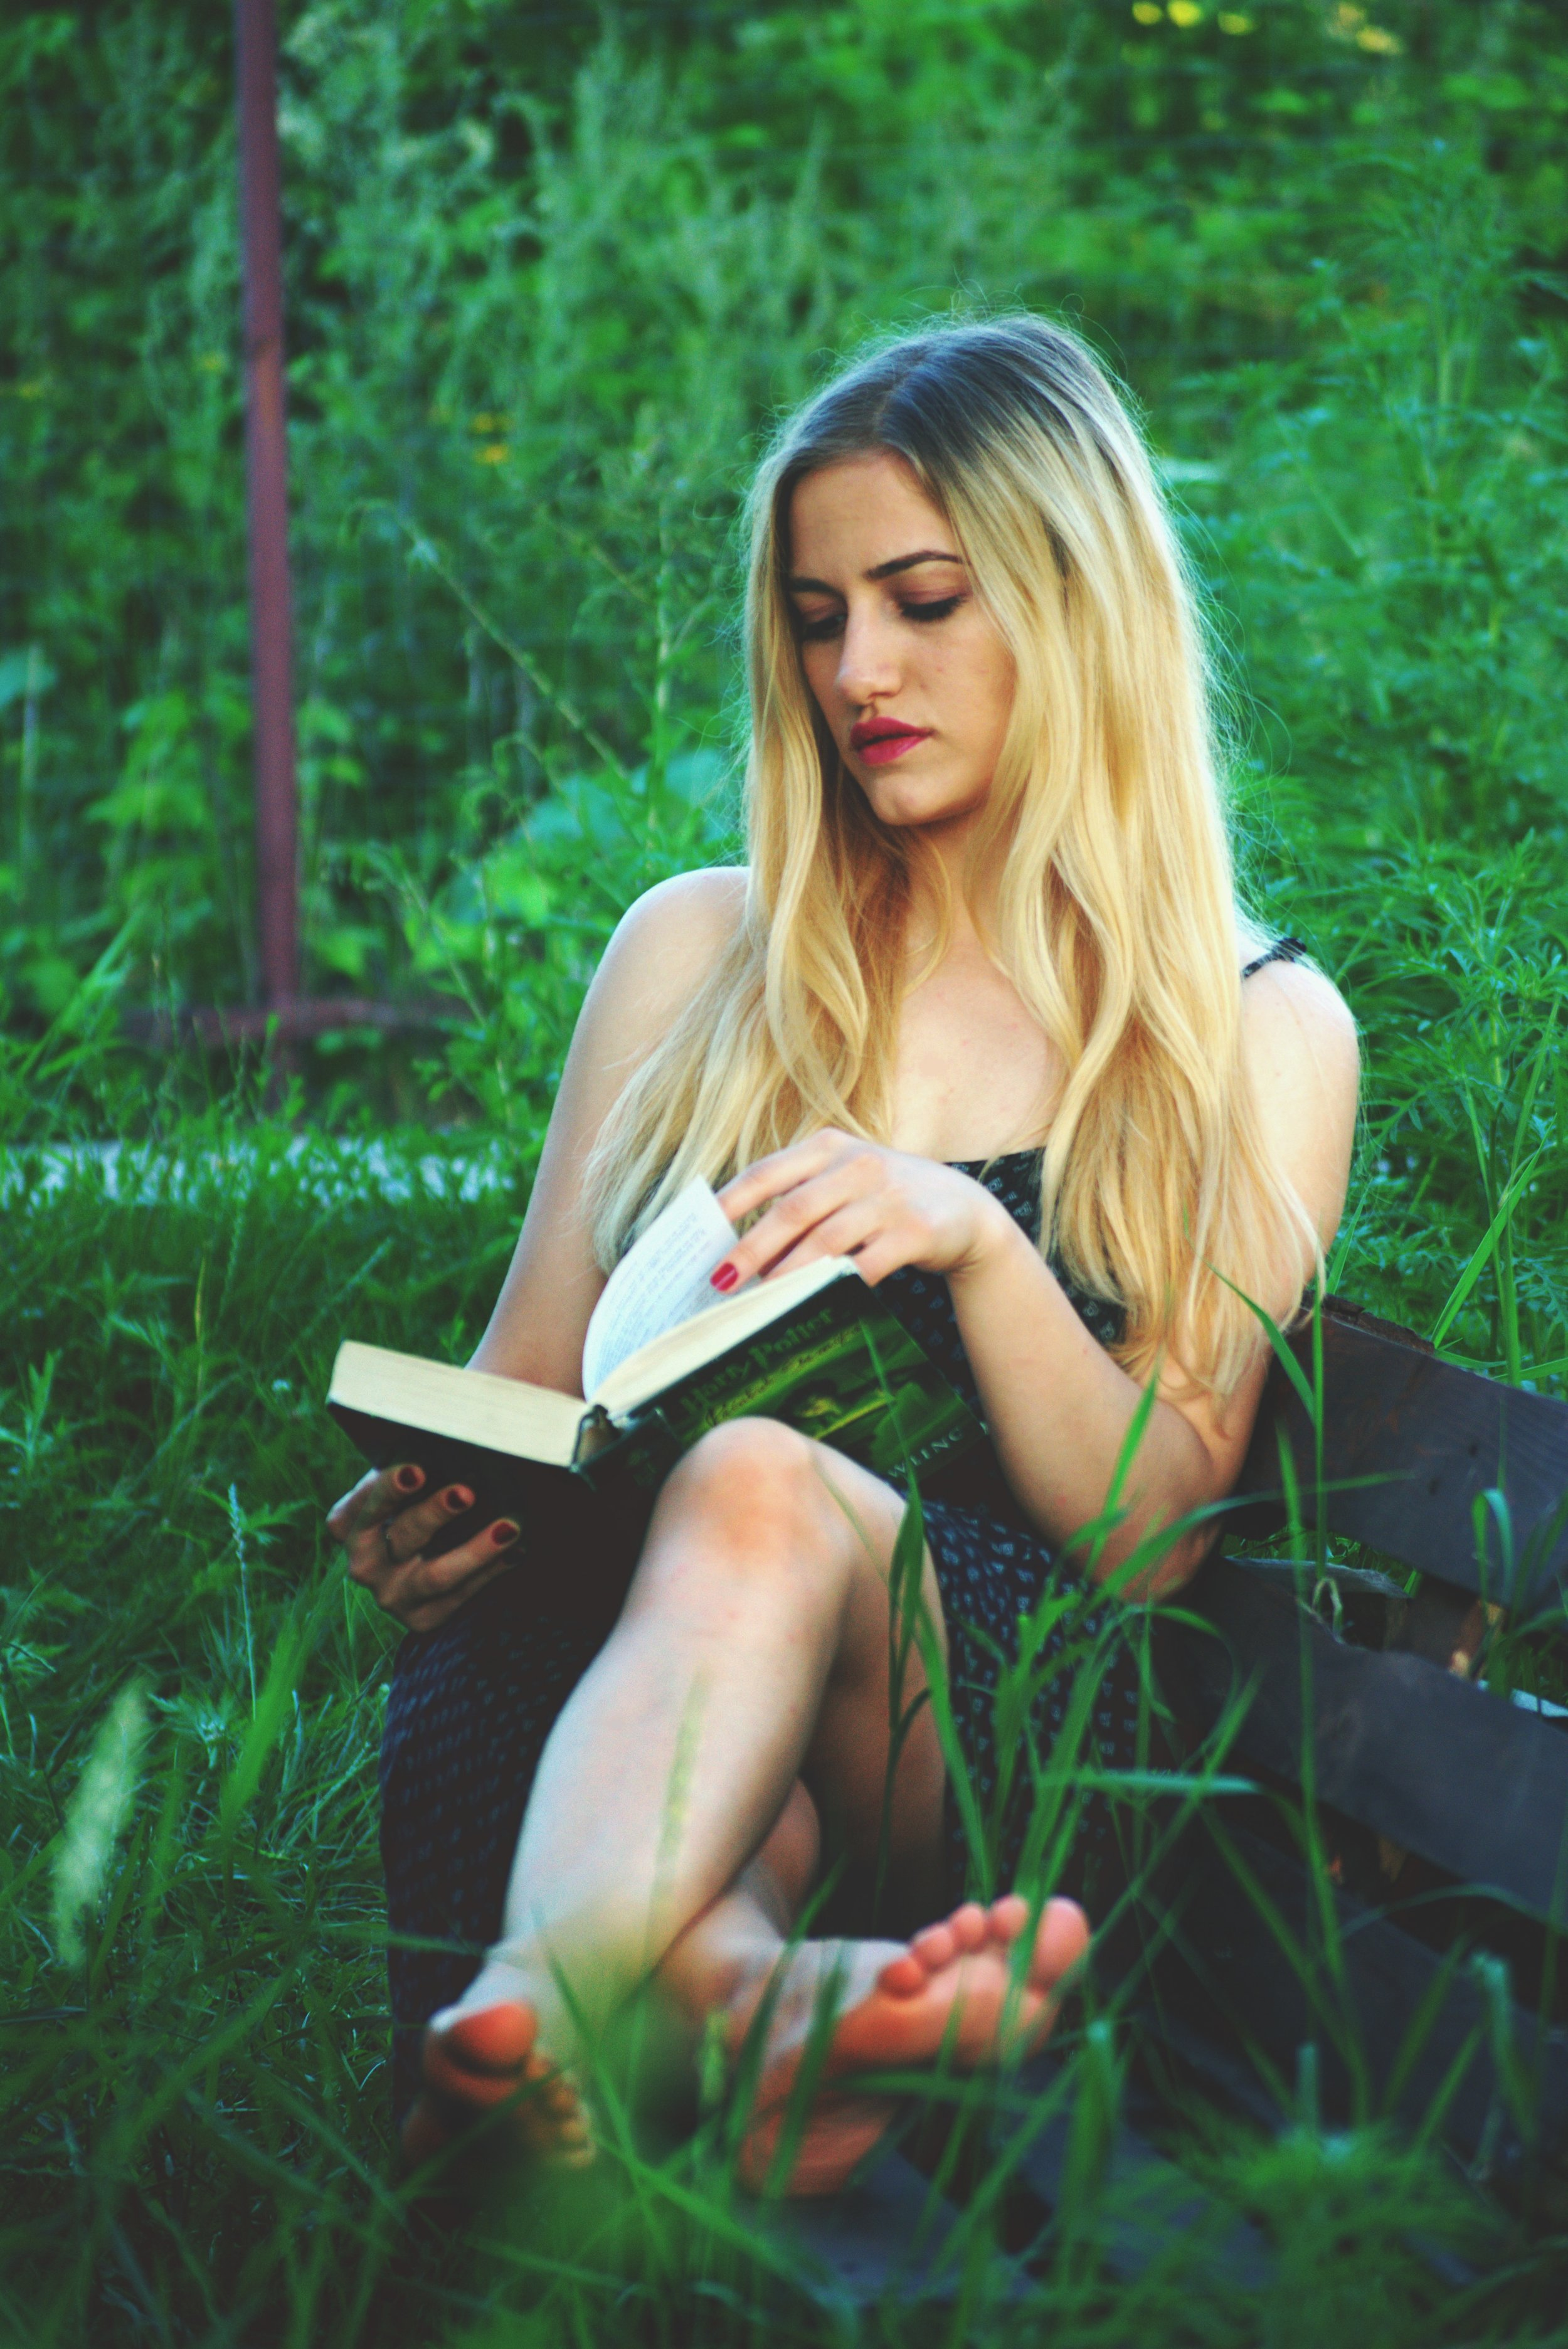 beautiful-bench-blonde-1319849.jpg